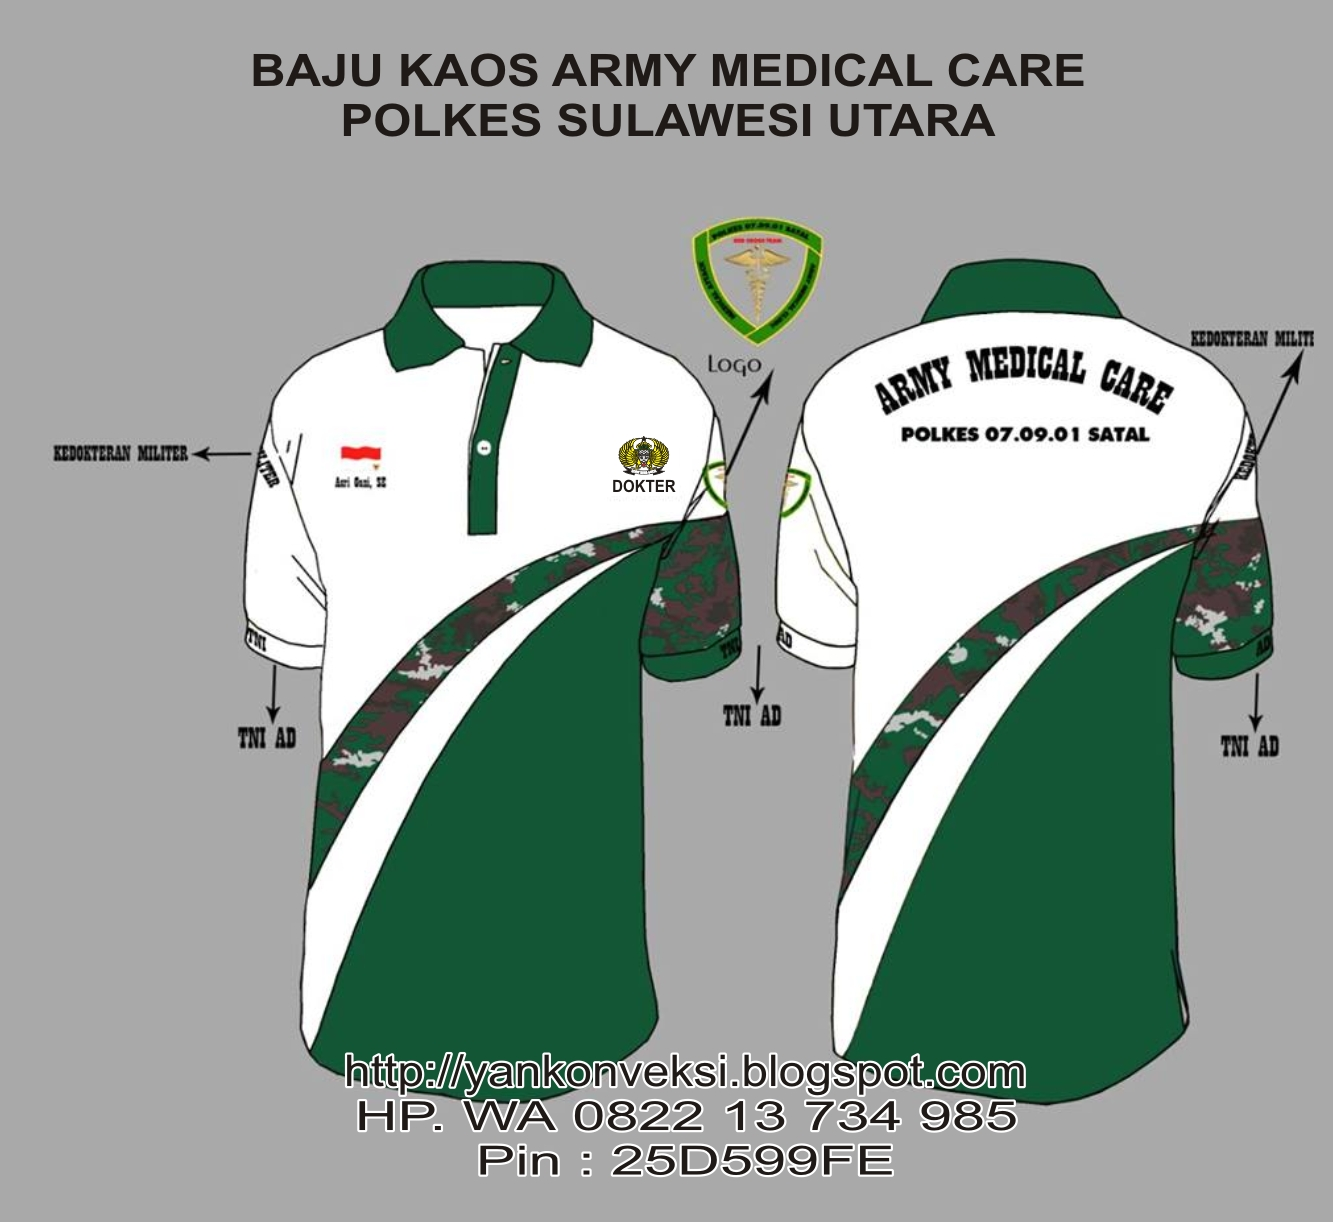 BAJU KAOS KERJA PESANAN ARMY MEDICAL CARE SULAWESI UTARA ANDA MAU PESAN HP WA 0822 13 734 985